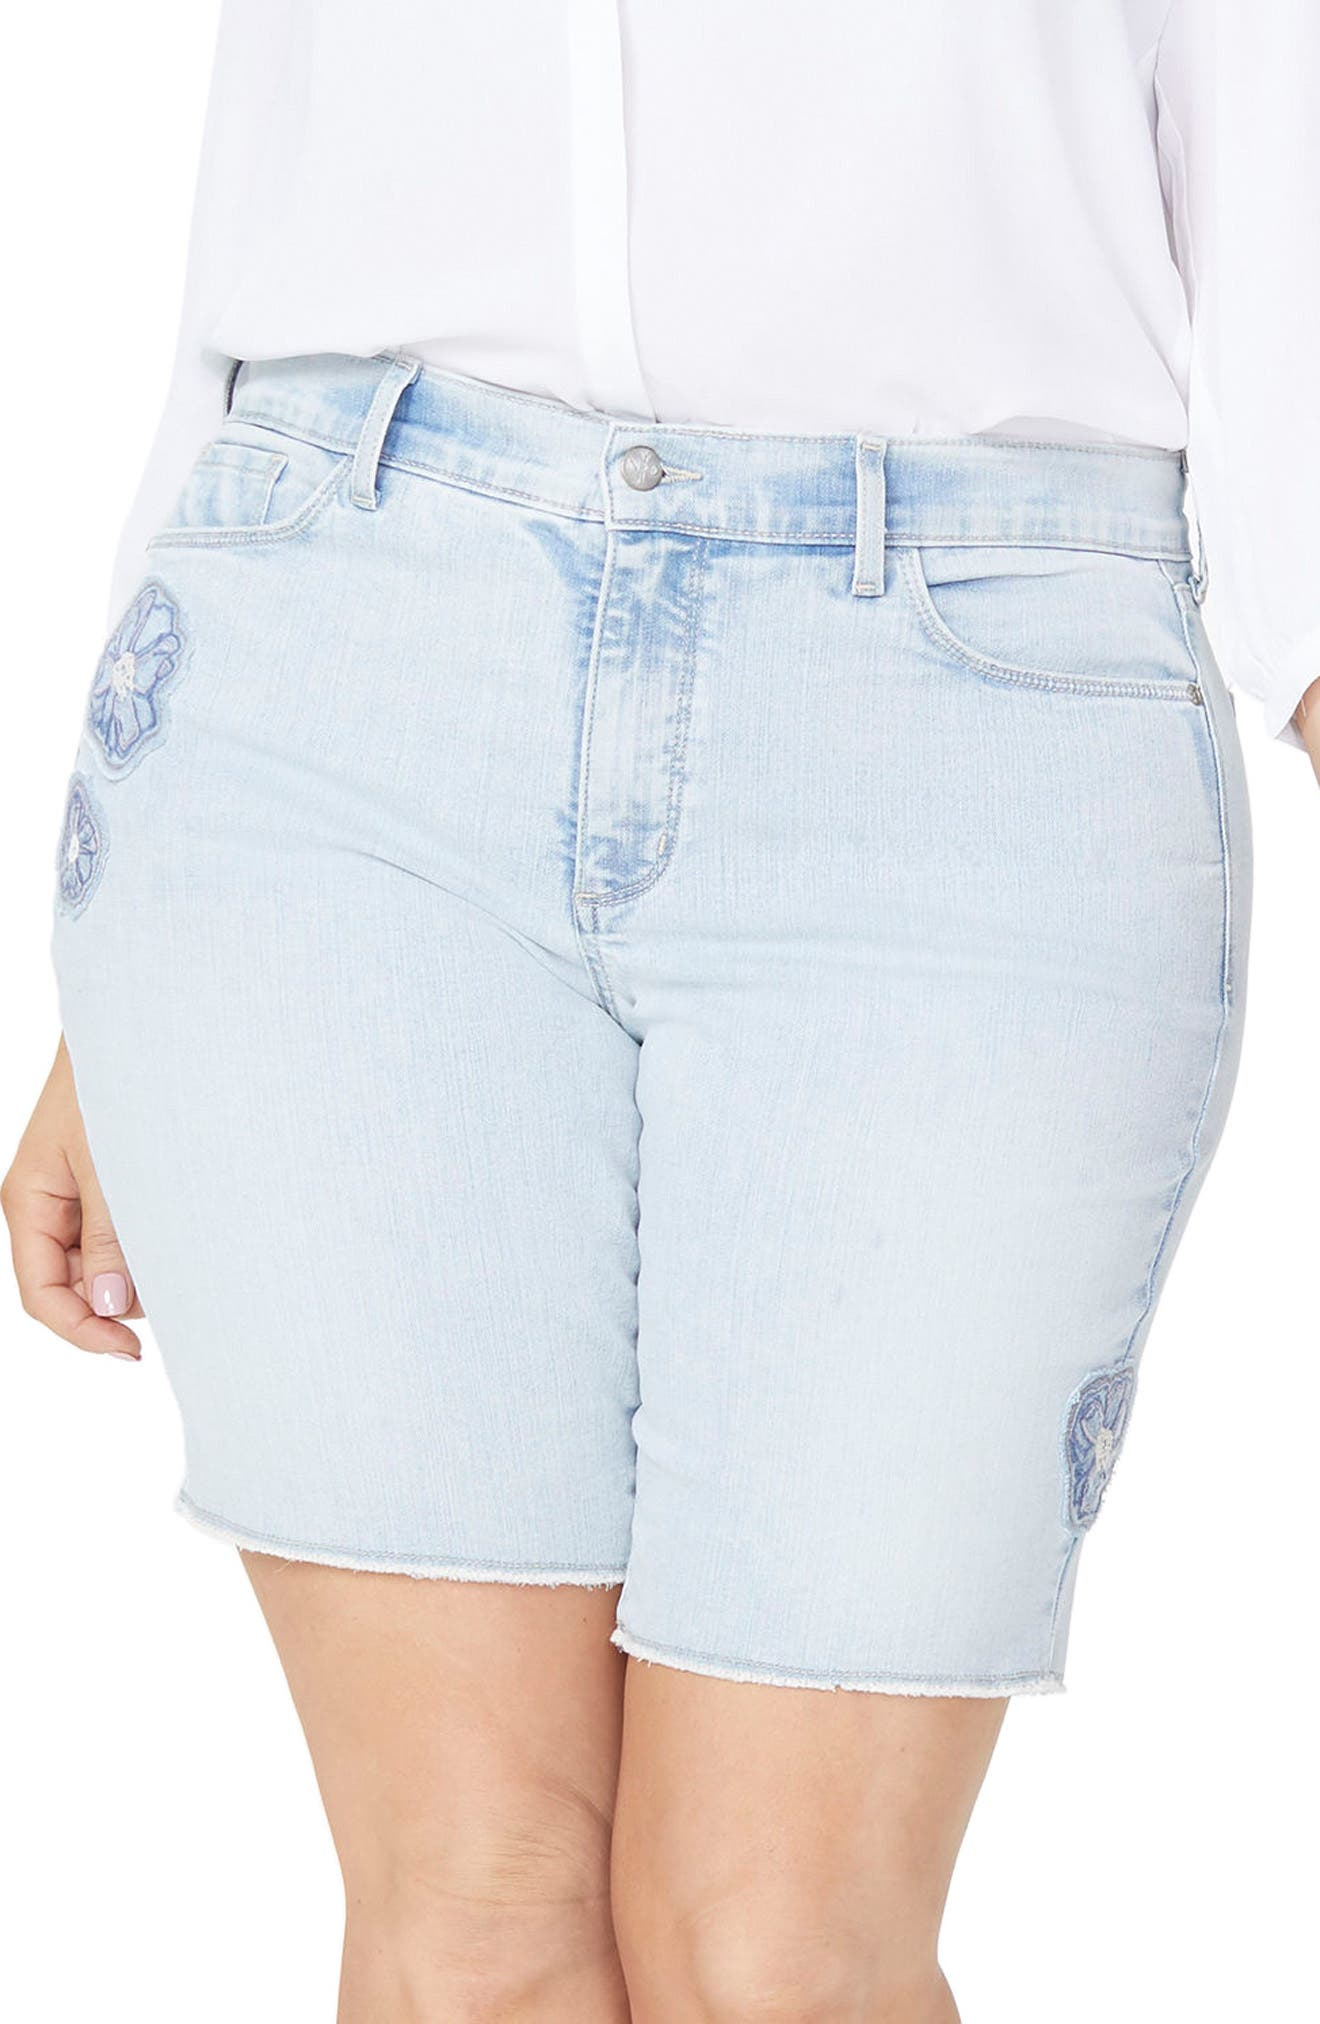 Briella Dream Blossom Denim Bermuda Shorts,                         Main,                         color, Palm Desert